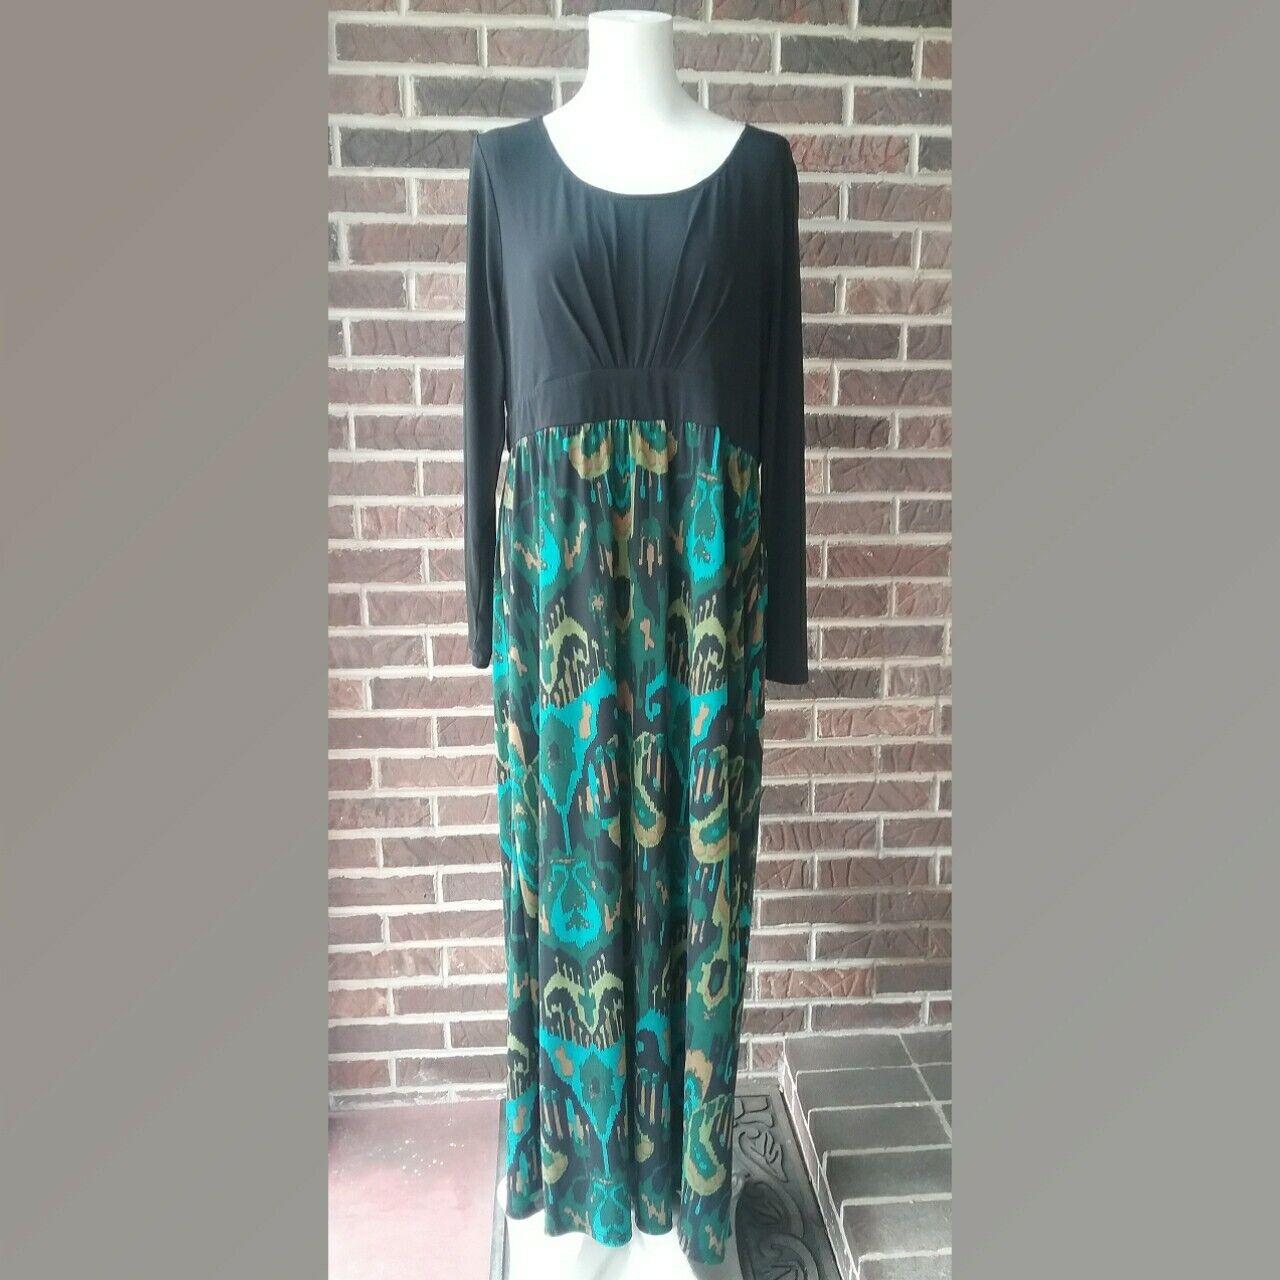 Bob Mackie Wearable Art Water Farbe Ikat Print  Scoop Neck  Dress Item  A229264